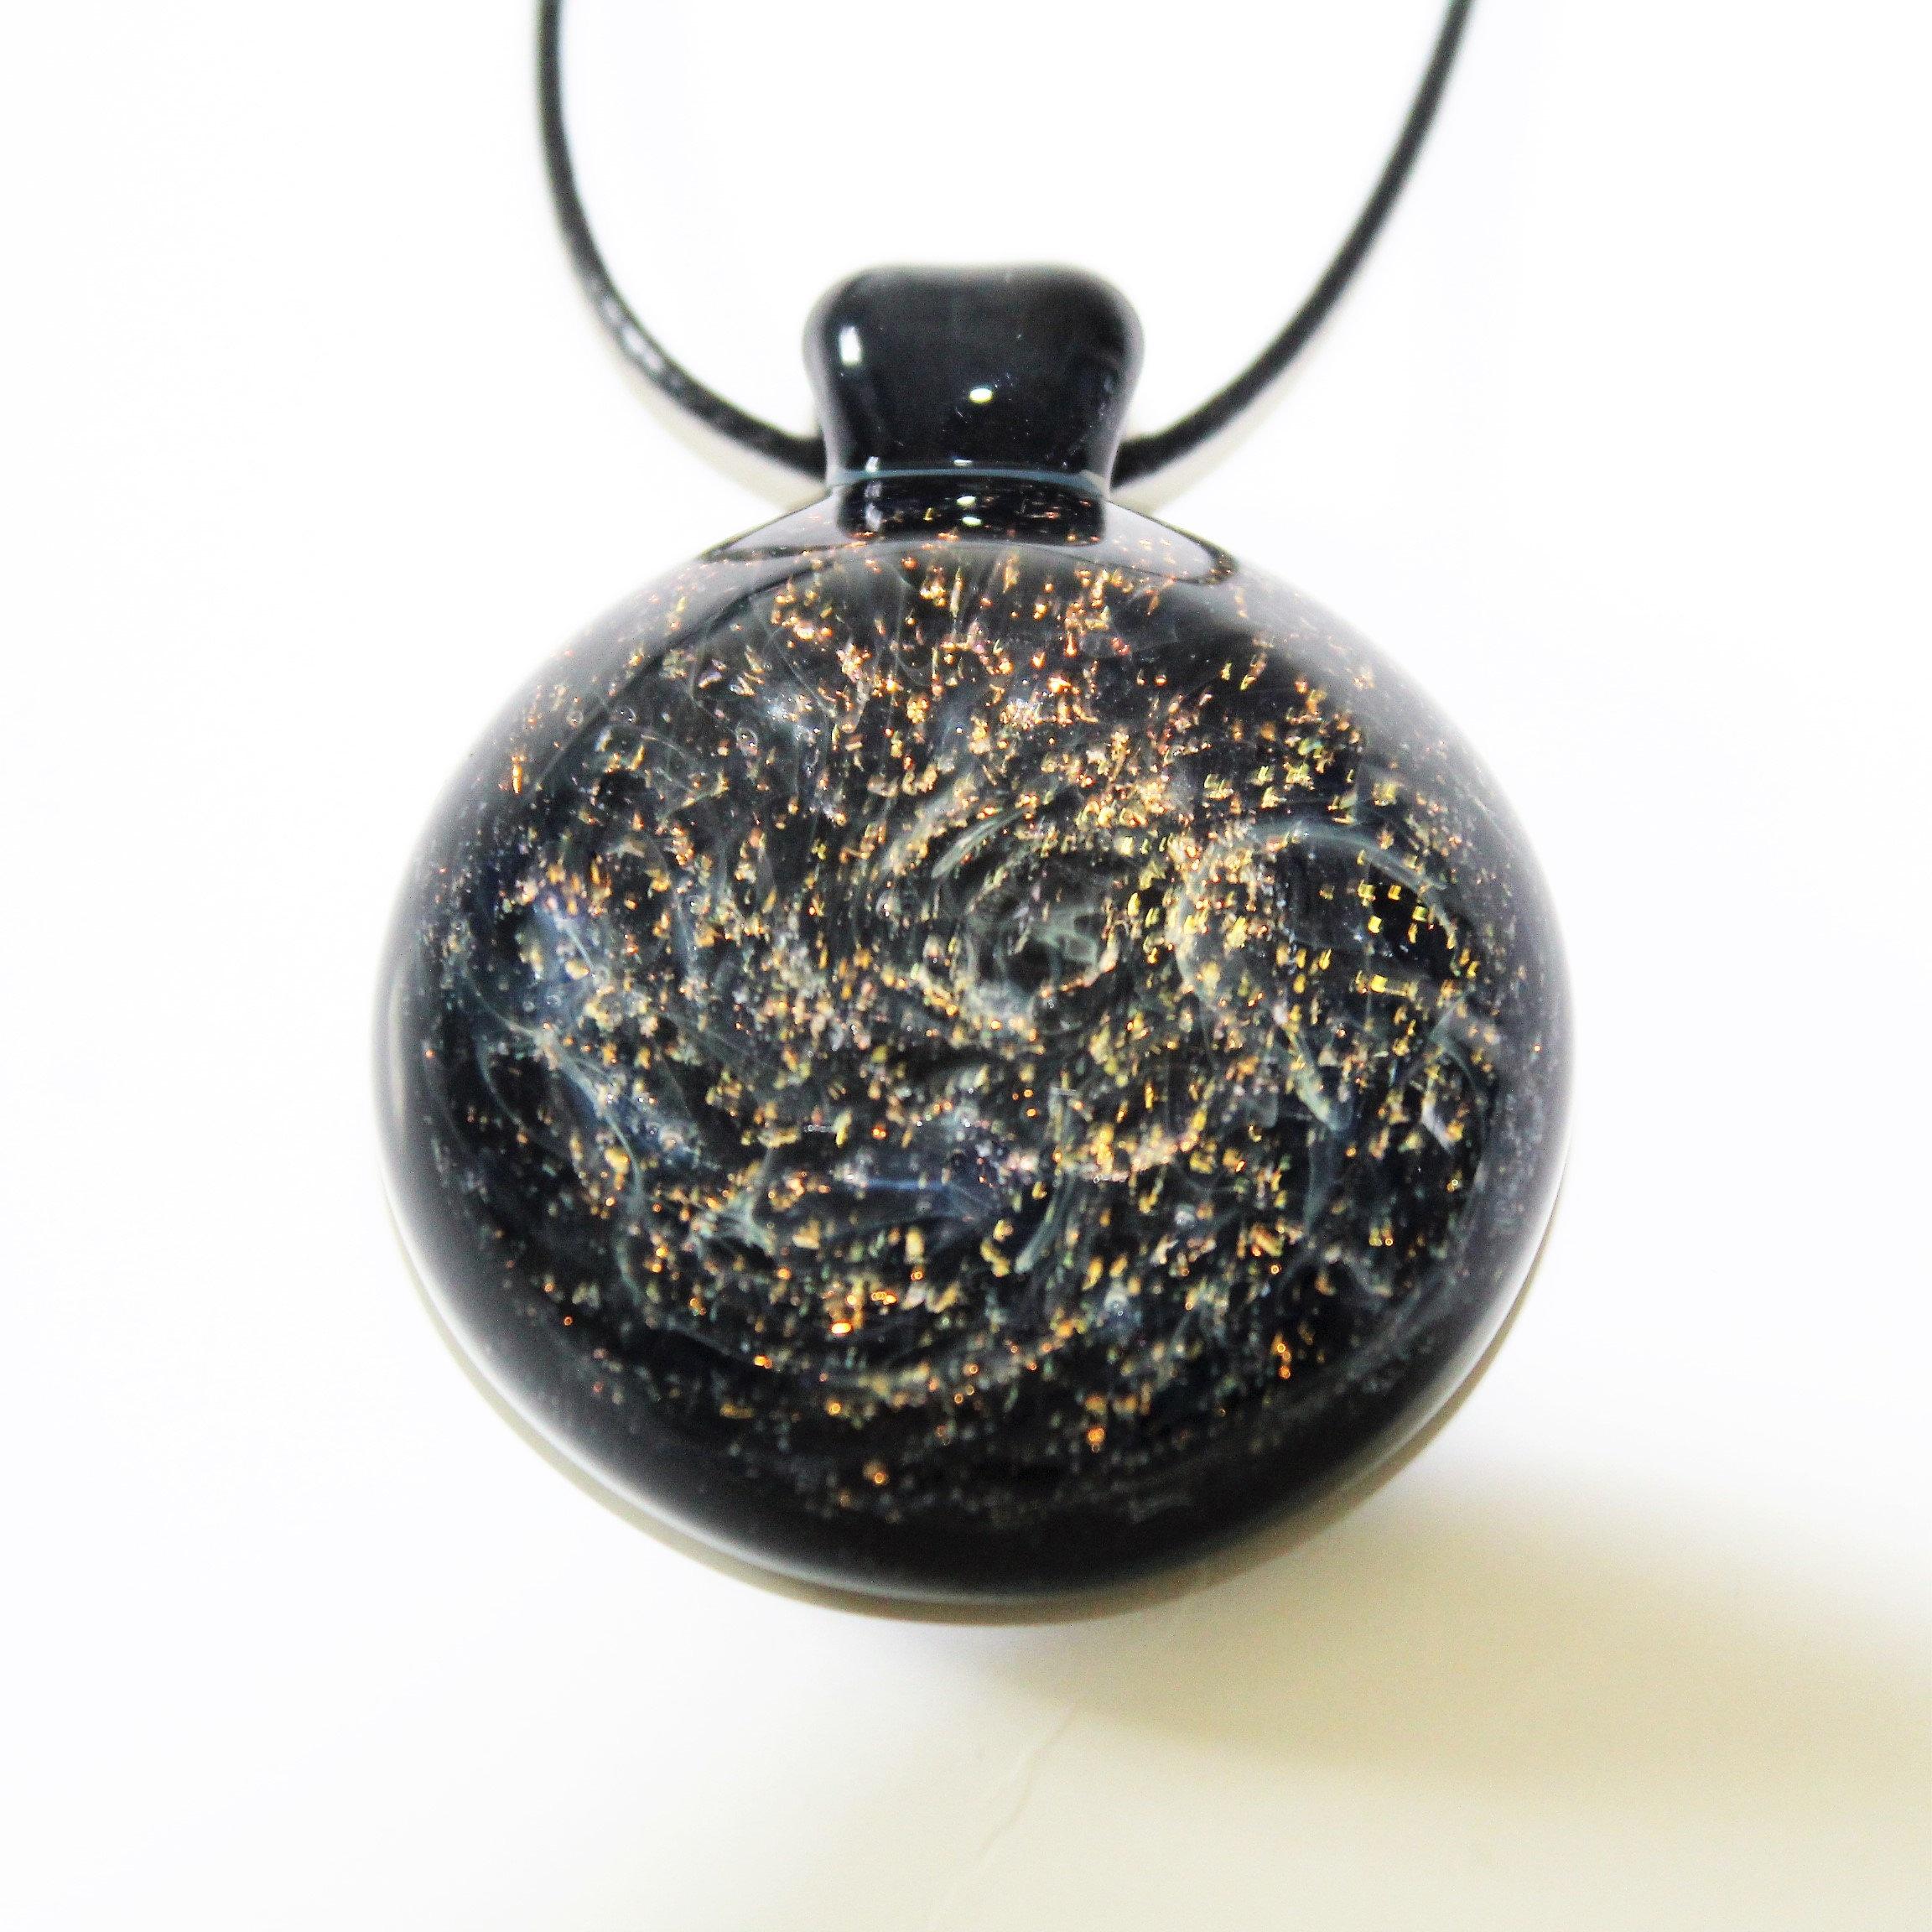 heady glass pendant galaxy blown glass necklace jewelry handmade heady glass gift for him trippy glass pendant gift her birthday - Heady Glass Pendants